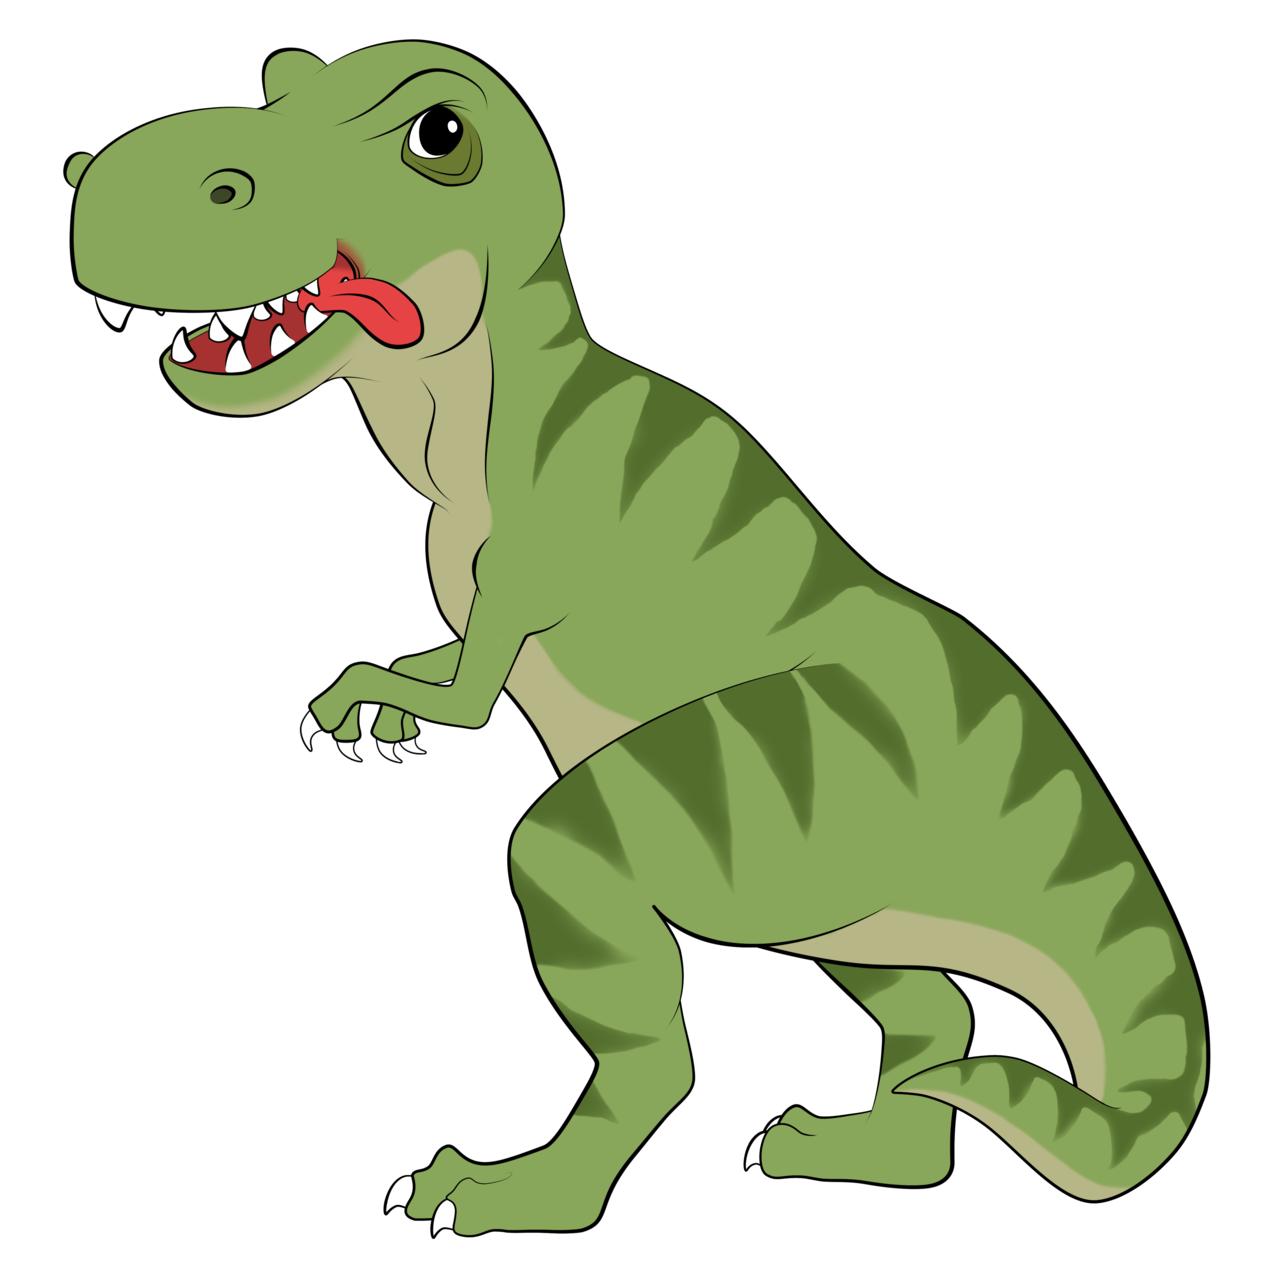 Dinosaur t-rex clipart png clip art download T Rex Png, png collections at sccpre.cat clip art download